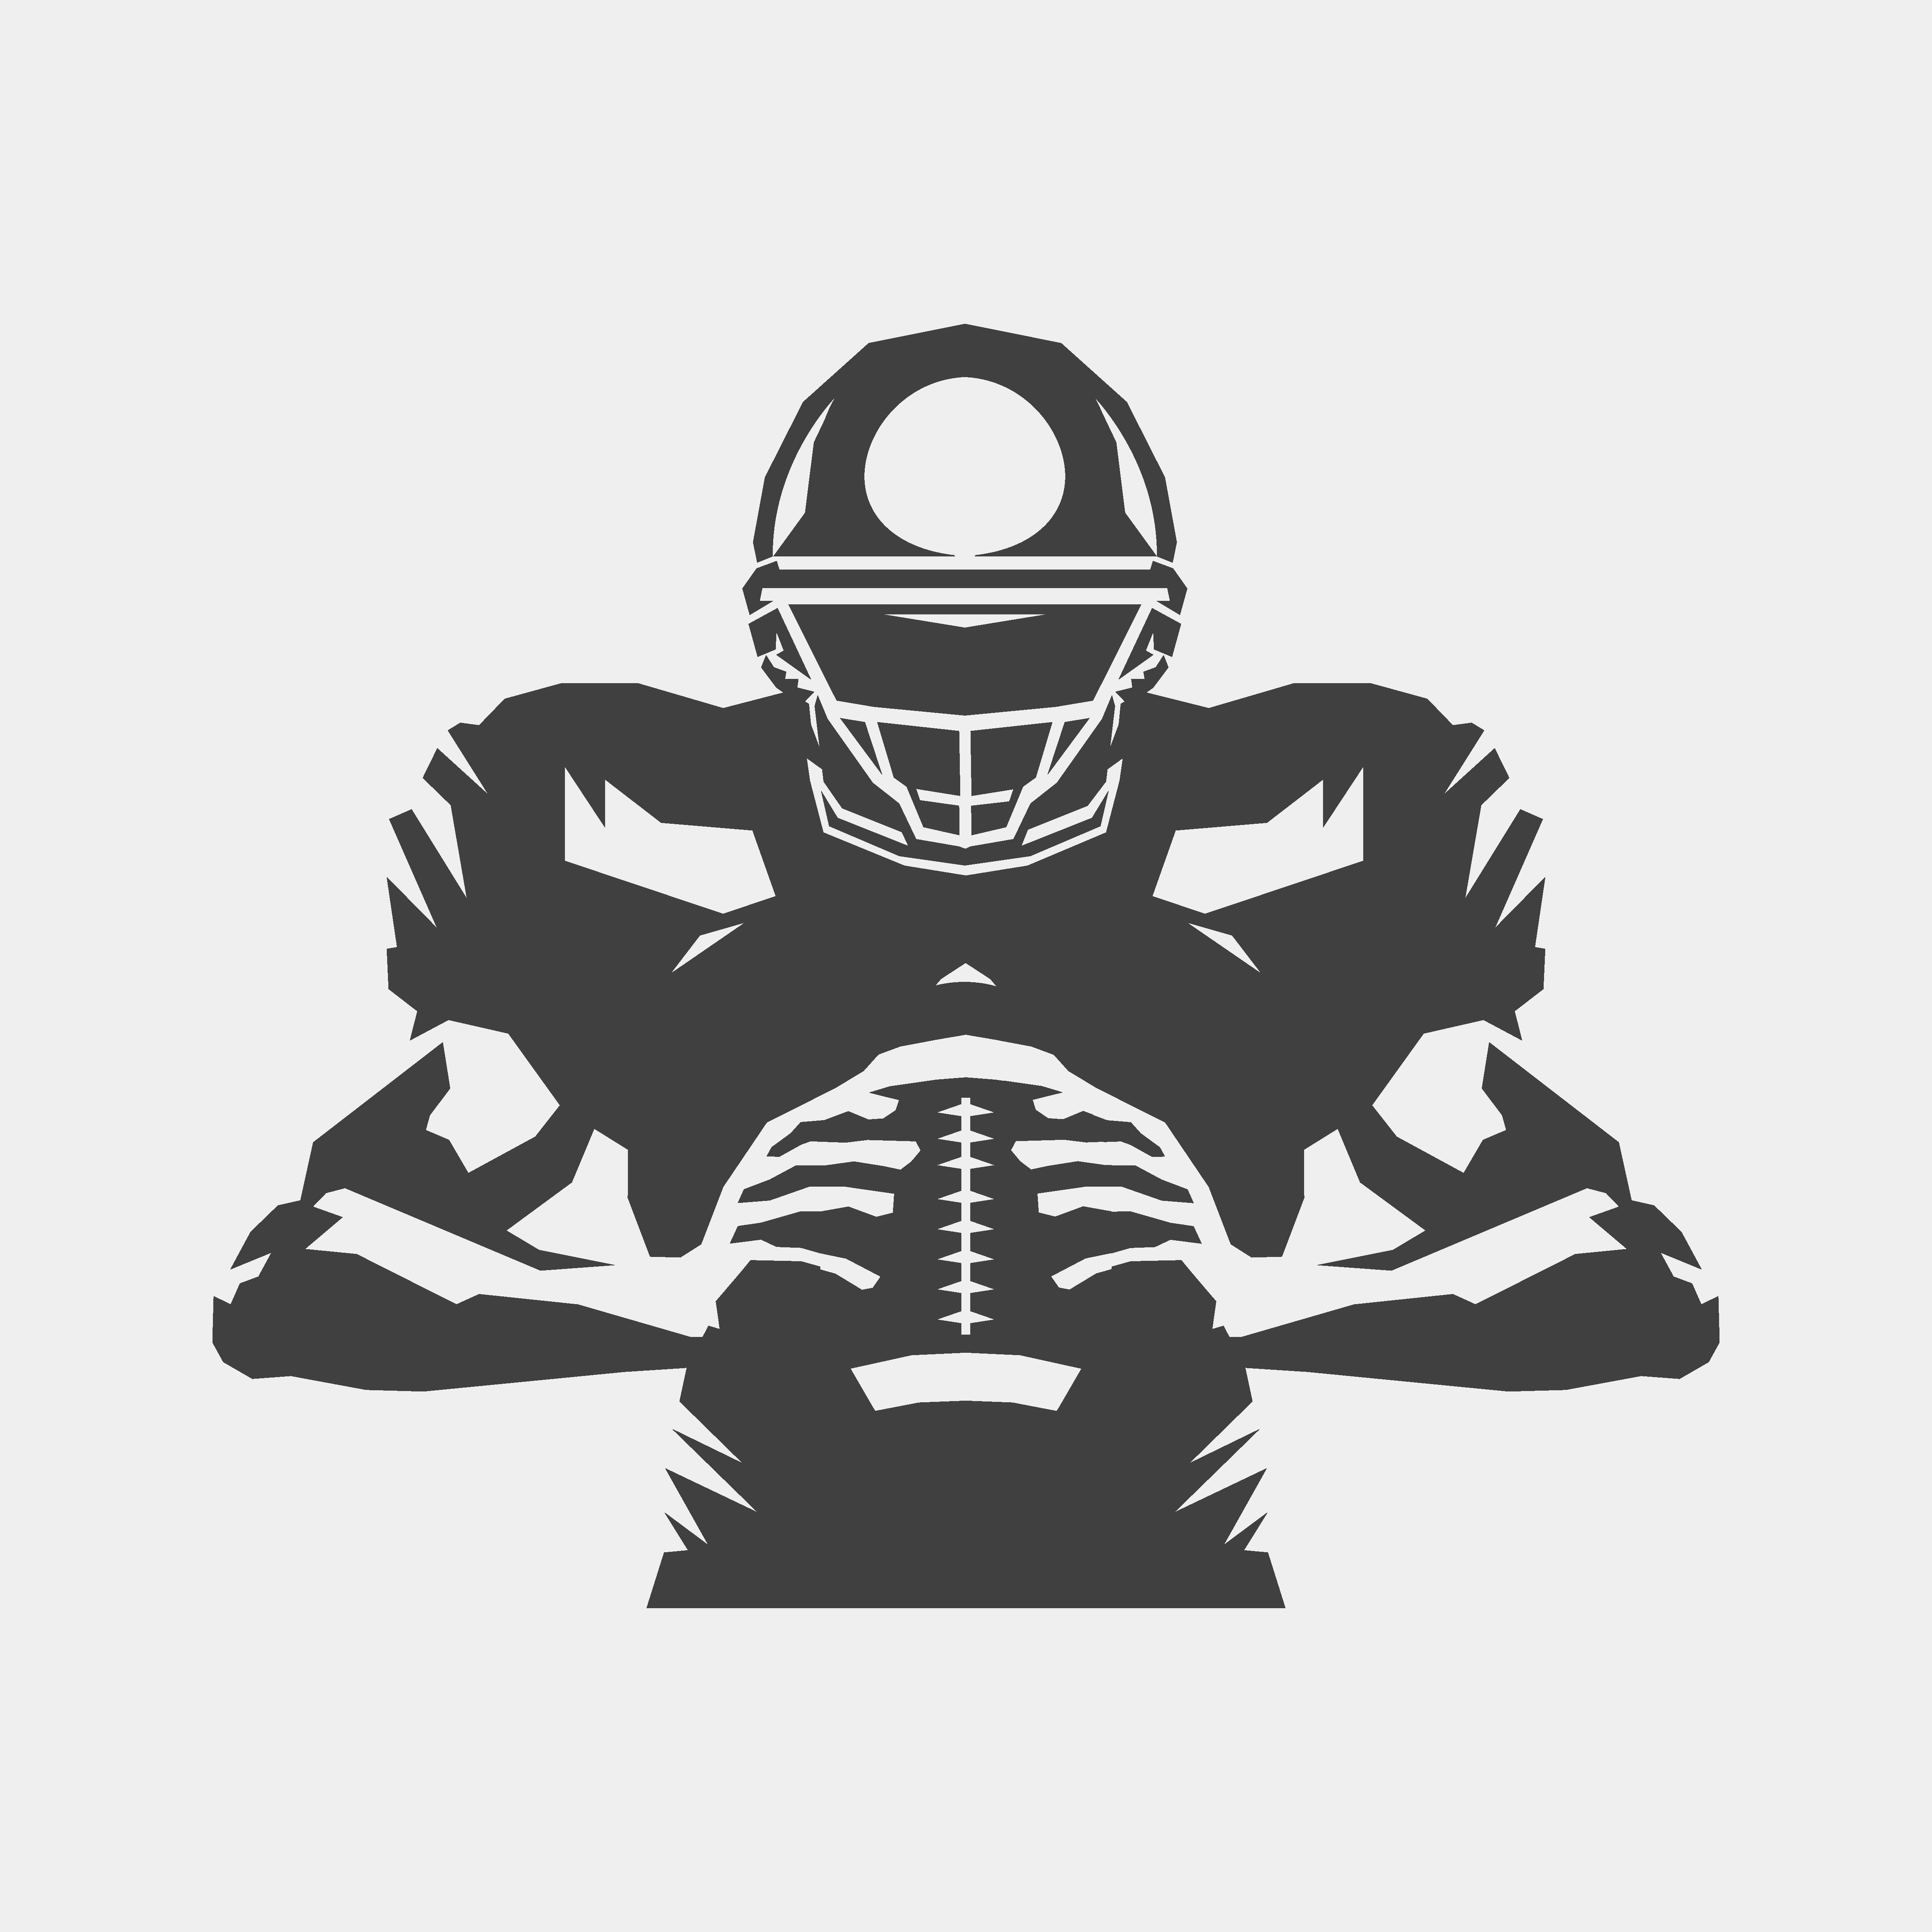 American football player.